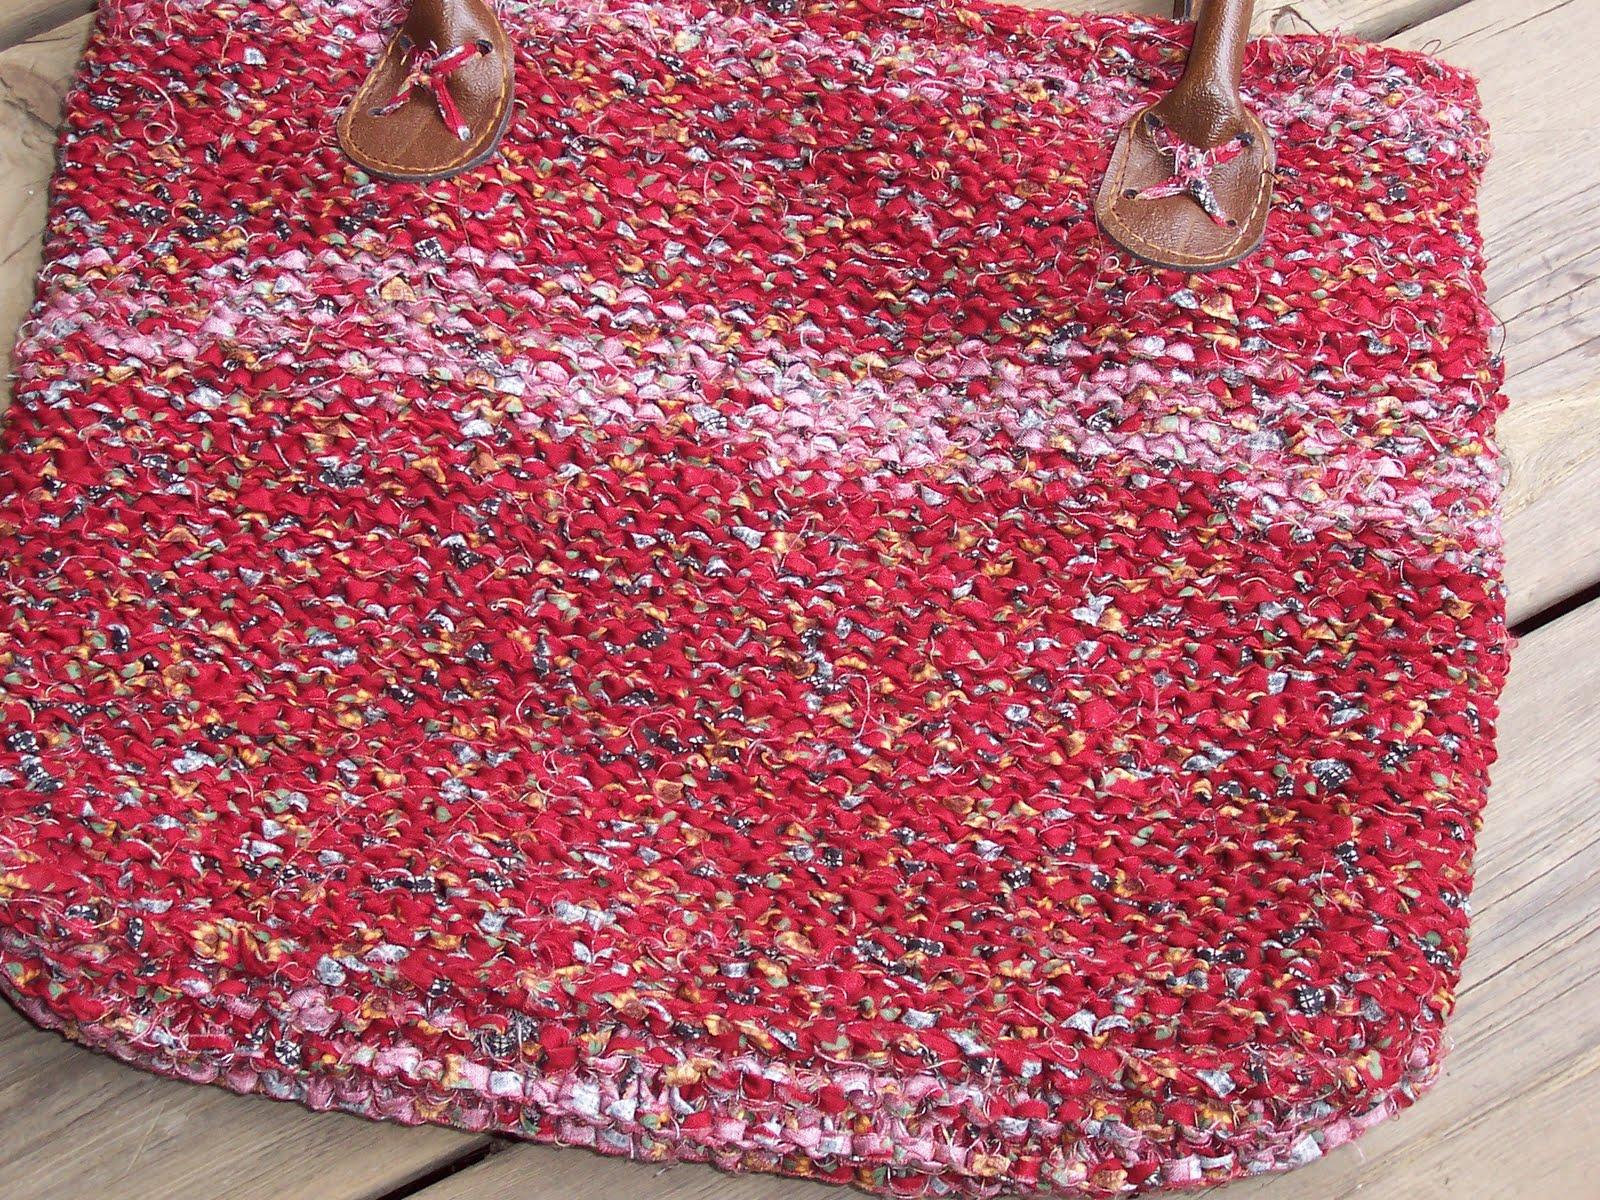 Rag Knitting Patterns : Grannypurl: Another fabric strip/rag knit bag